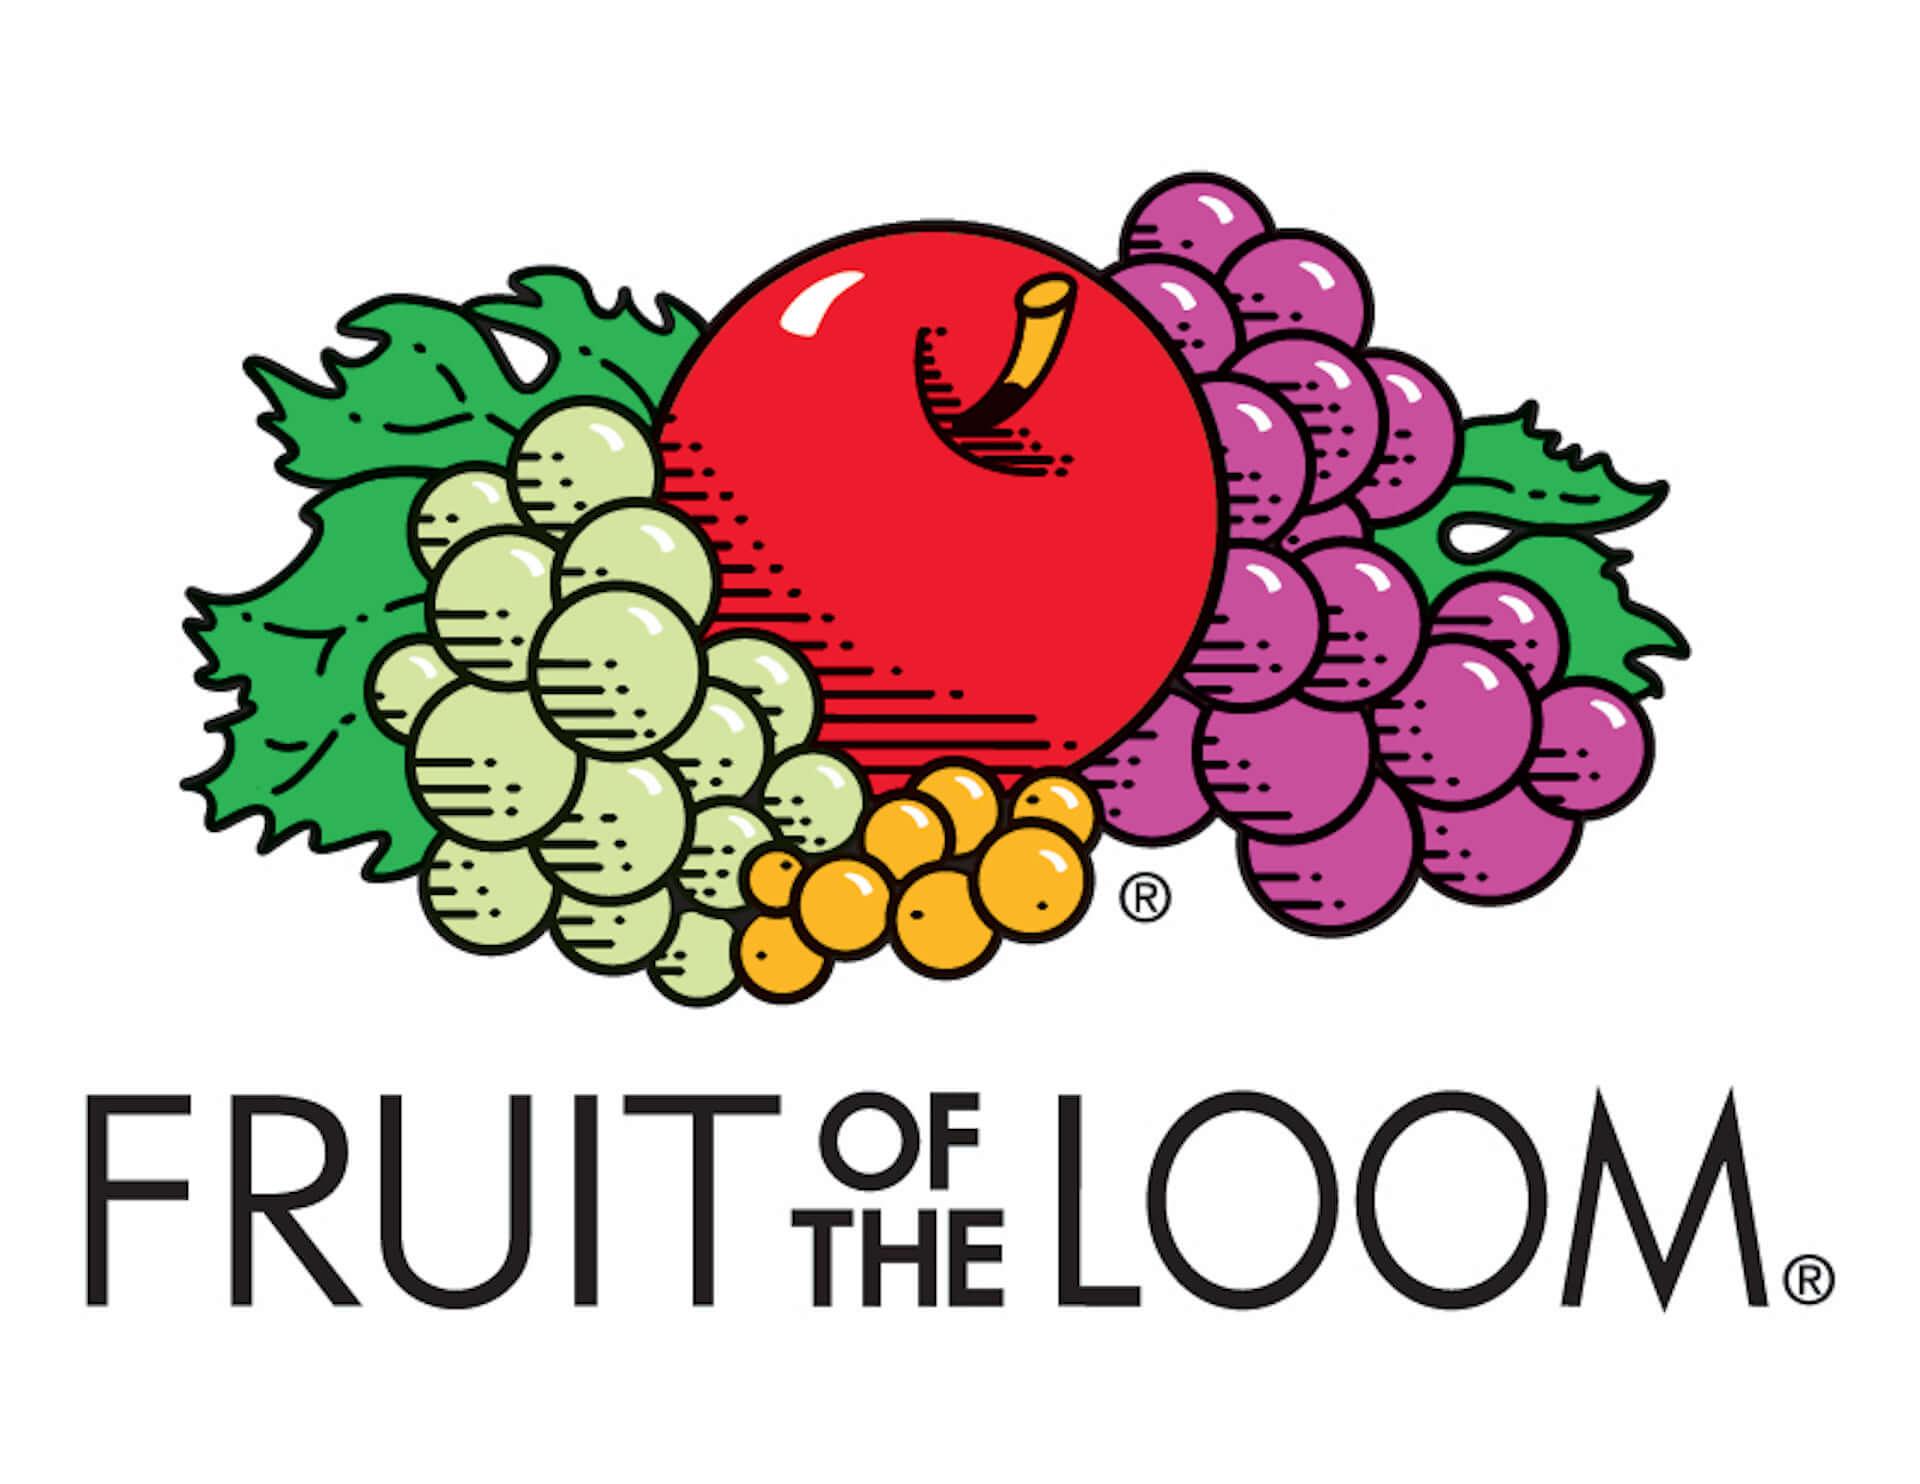 FRUIT OF THE LOOMから限定スウェットシャツが販売決定!フルーツカラーの『BE@RBRICK』も付属 lf200907_fruitoftheloom_3-1920x1484